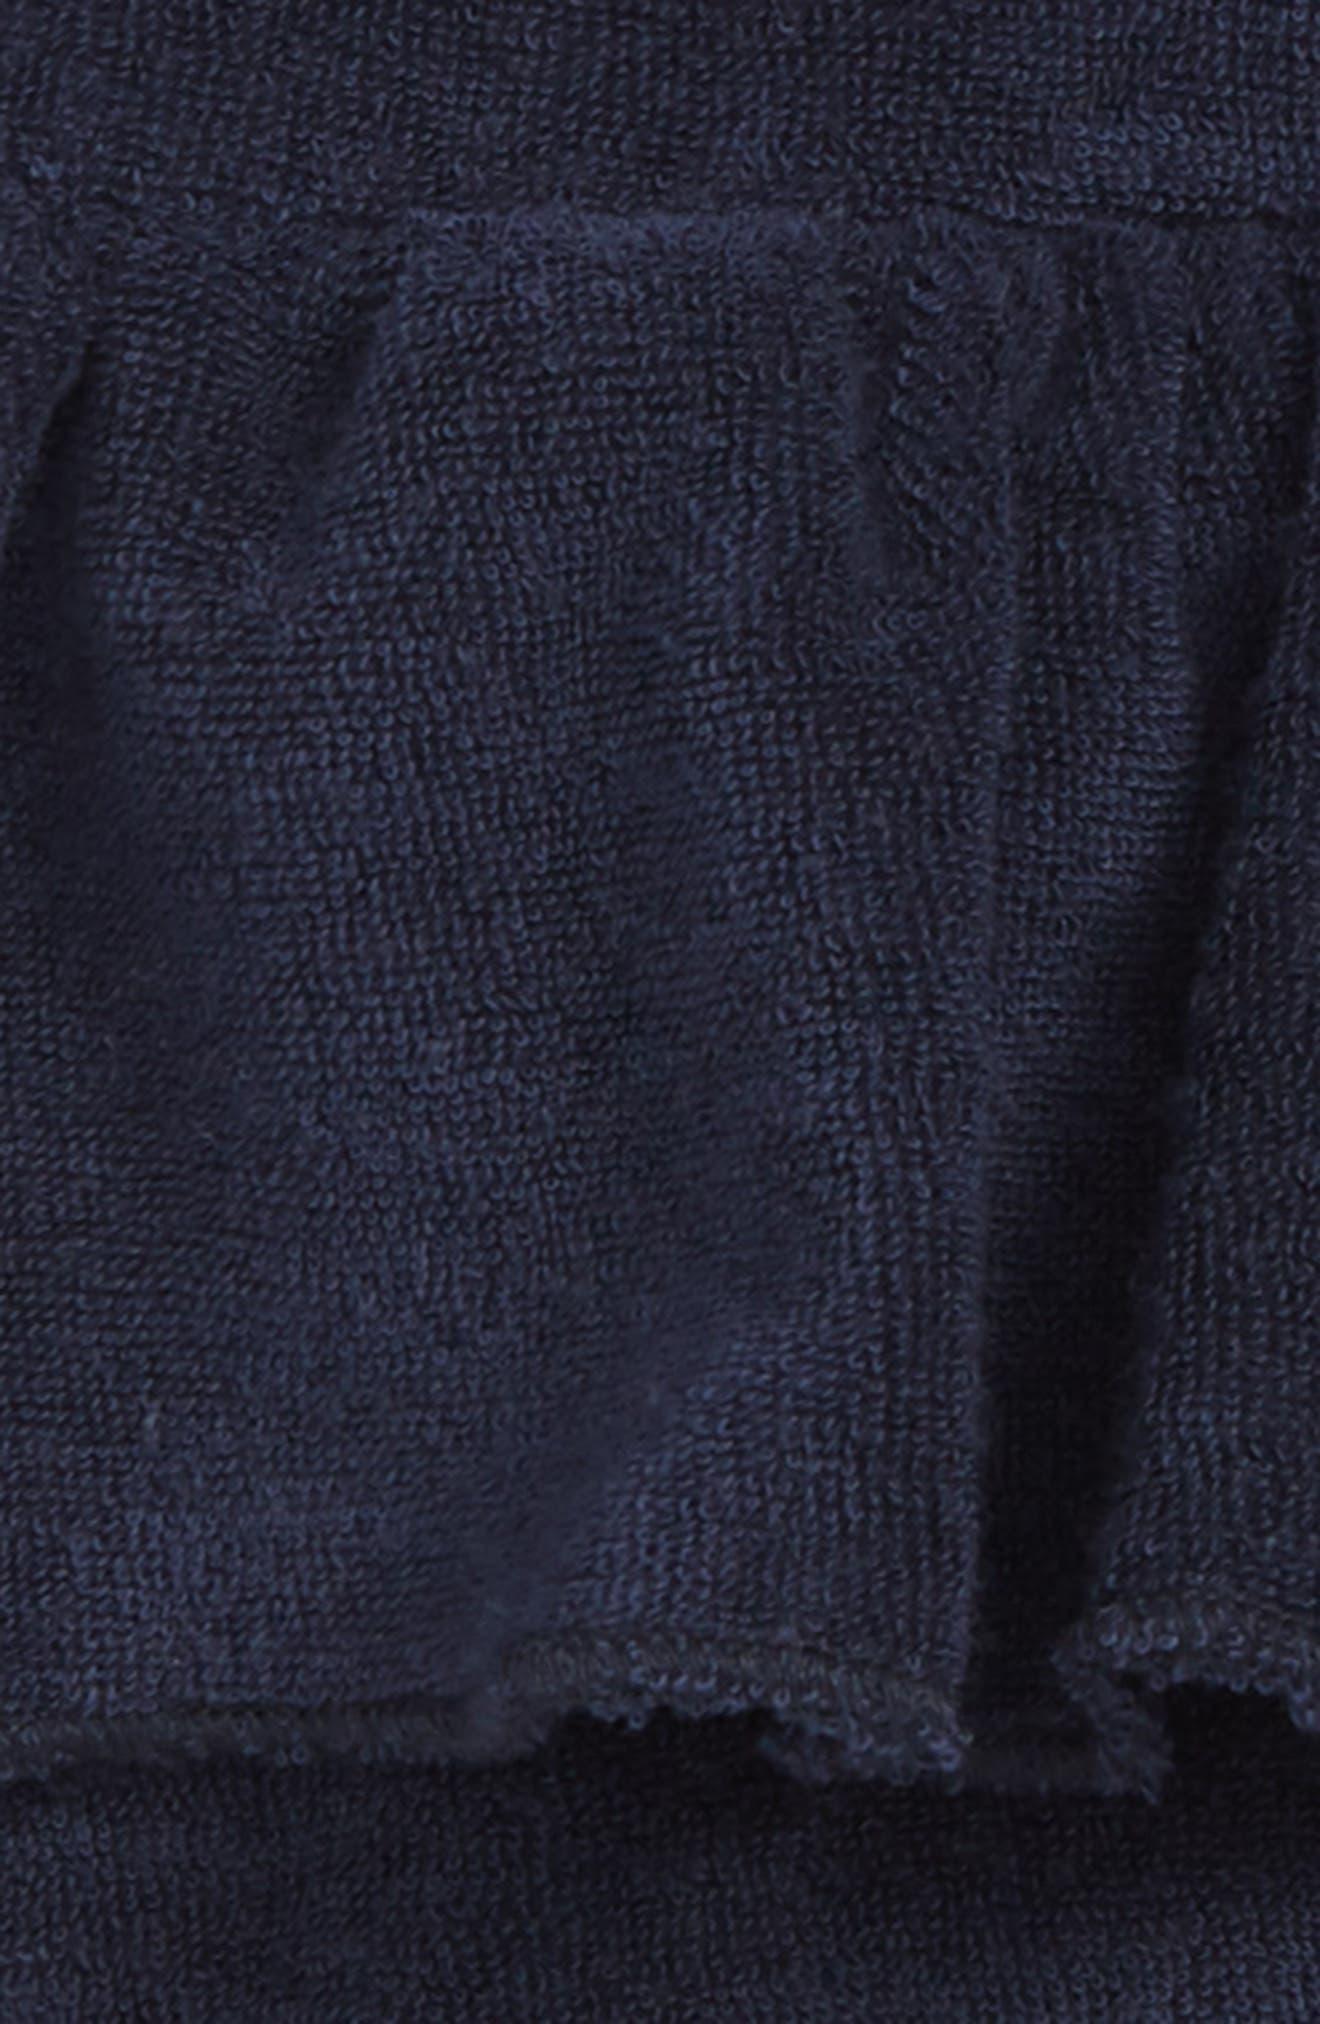 Frill Organic Cotton Beach Shorts,                             Alternate thumbnail 2, color,                             Blue